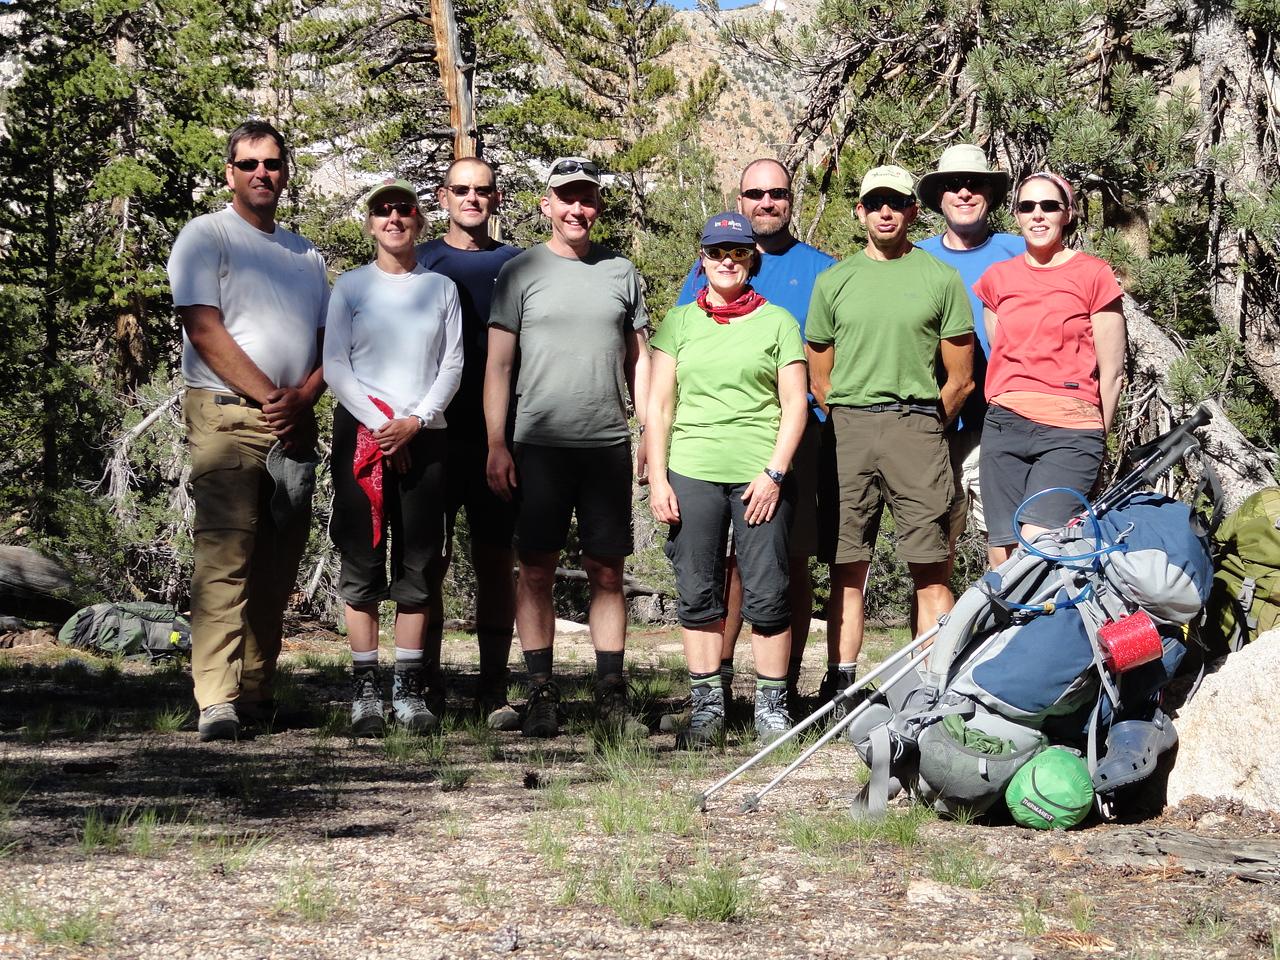 Group photo at the start of day 2 at our campsite near Charlotte Lake. L-R: Chris, Susan, Brian, John, Robin, David M., Kirk, David S., Coleen.